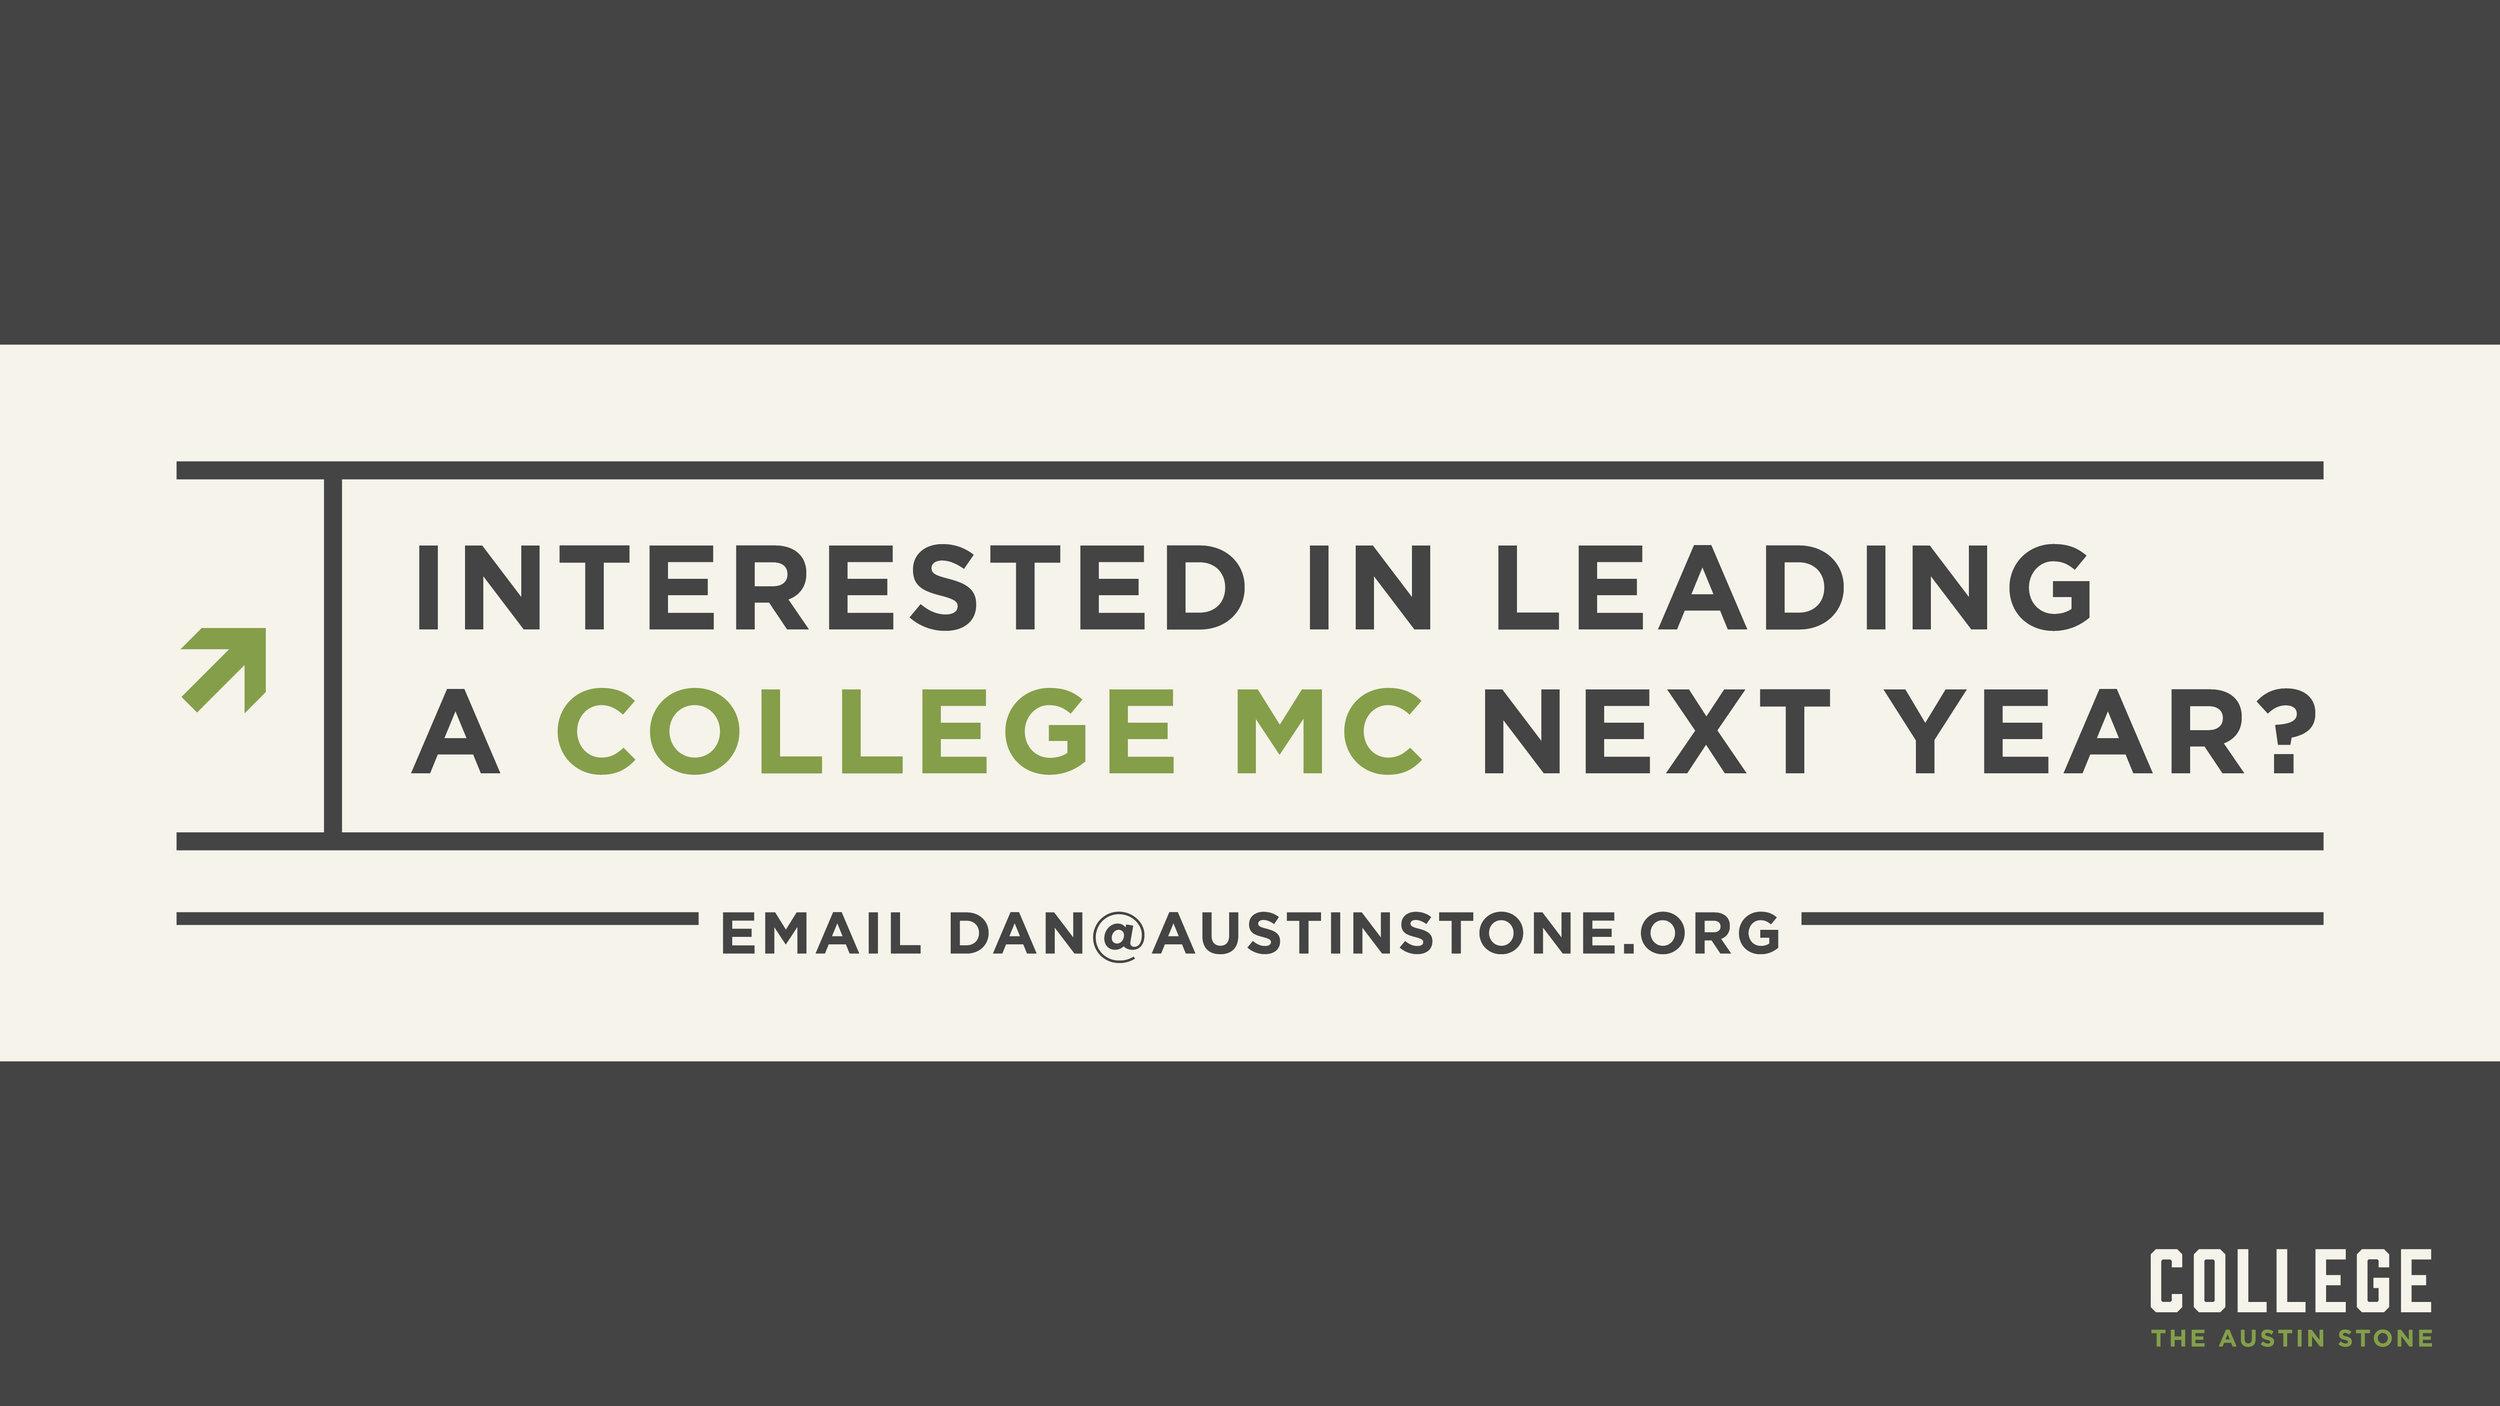 09-04-SOUTH-College-ASOC-MC-Lead.jpg